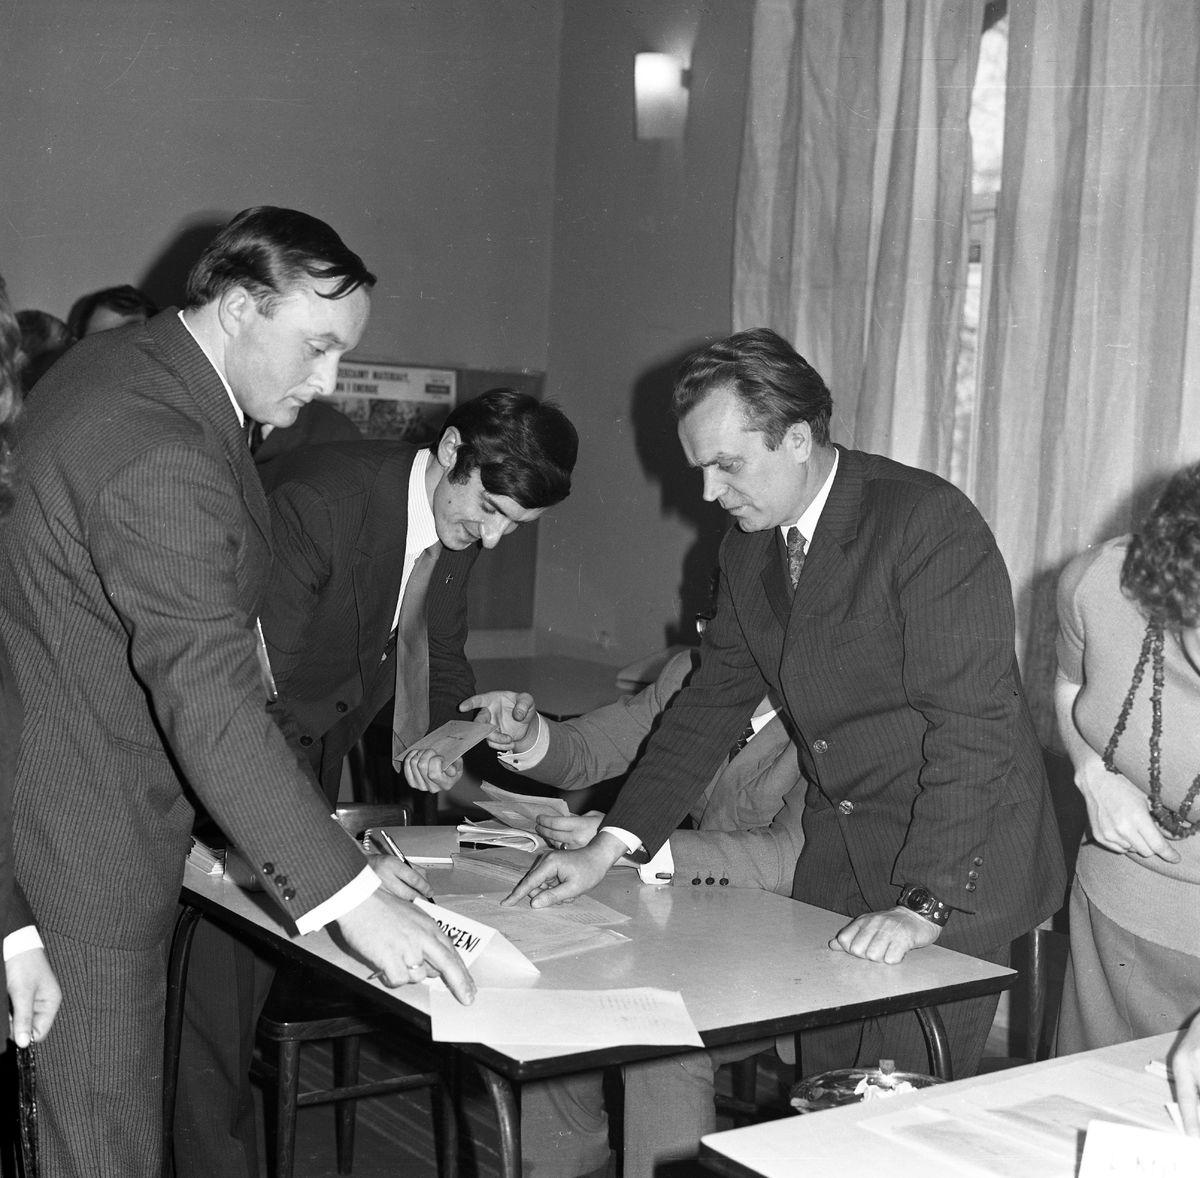 Spotkanie partyjne, 1974 r. [5]